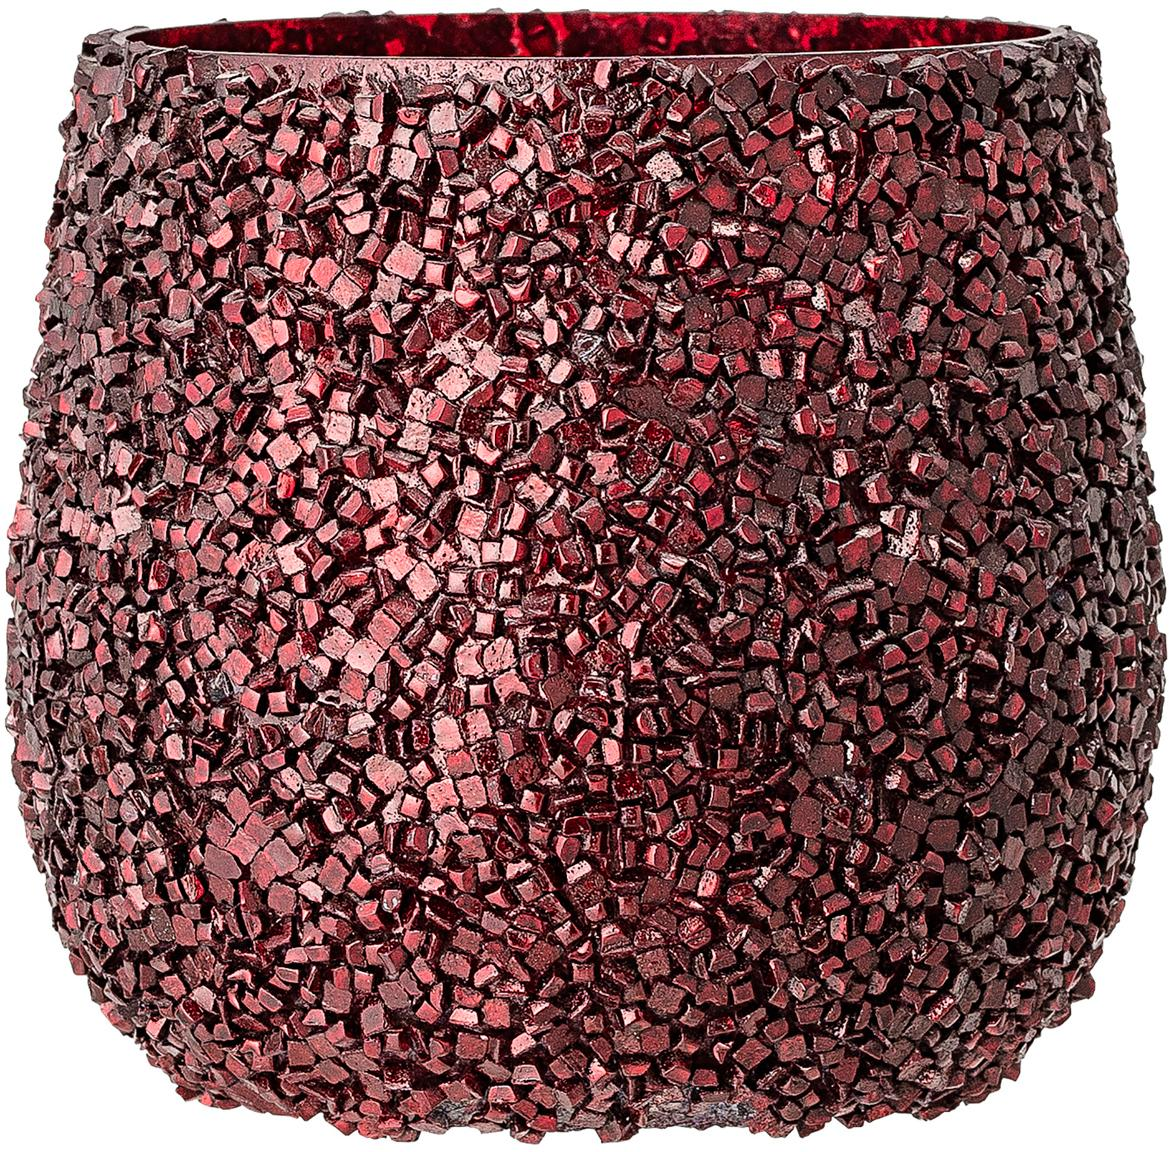 Waxinelichthouder Asa, Glas, Rood, Ø 10 x H 10 cm